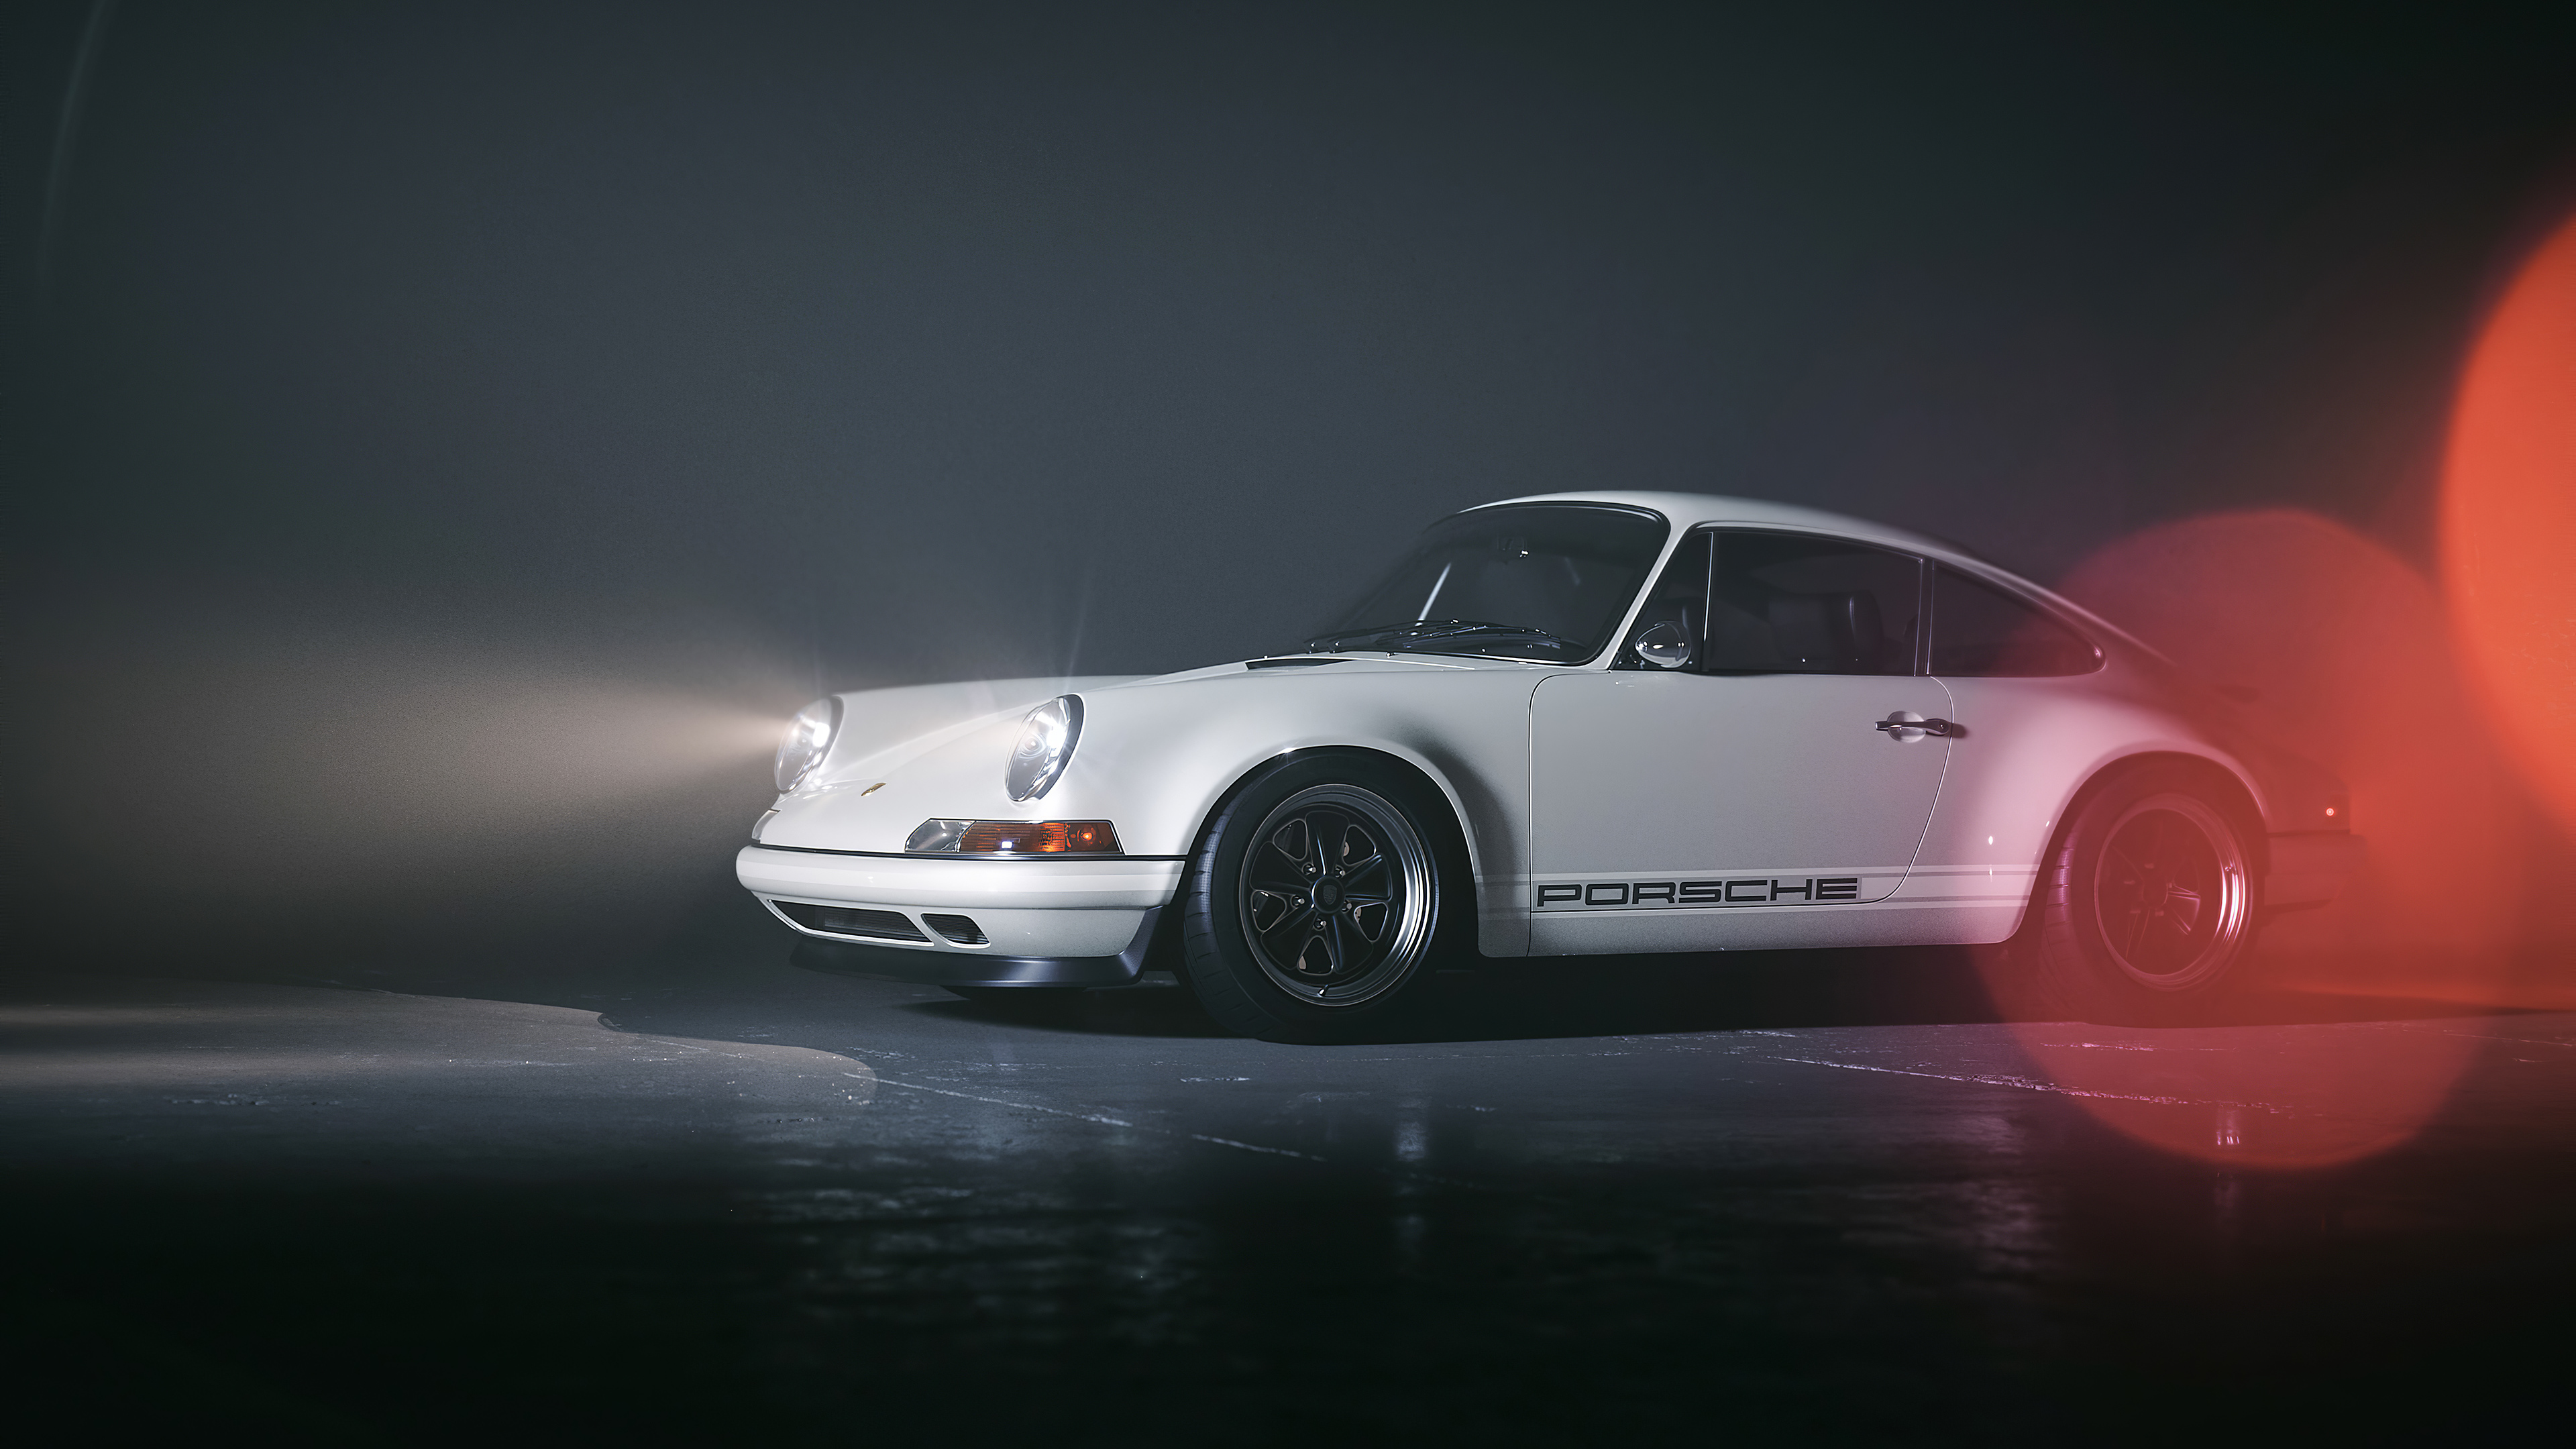 Wallpaper 4k White Porsche 4k Wallpapers Behance Wallpapers